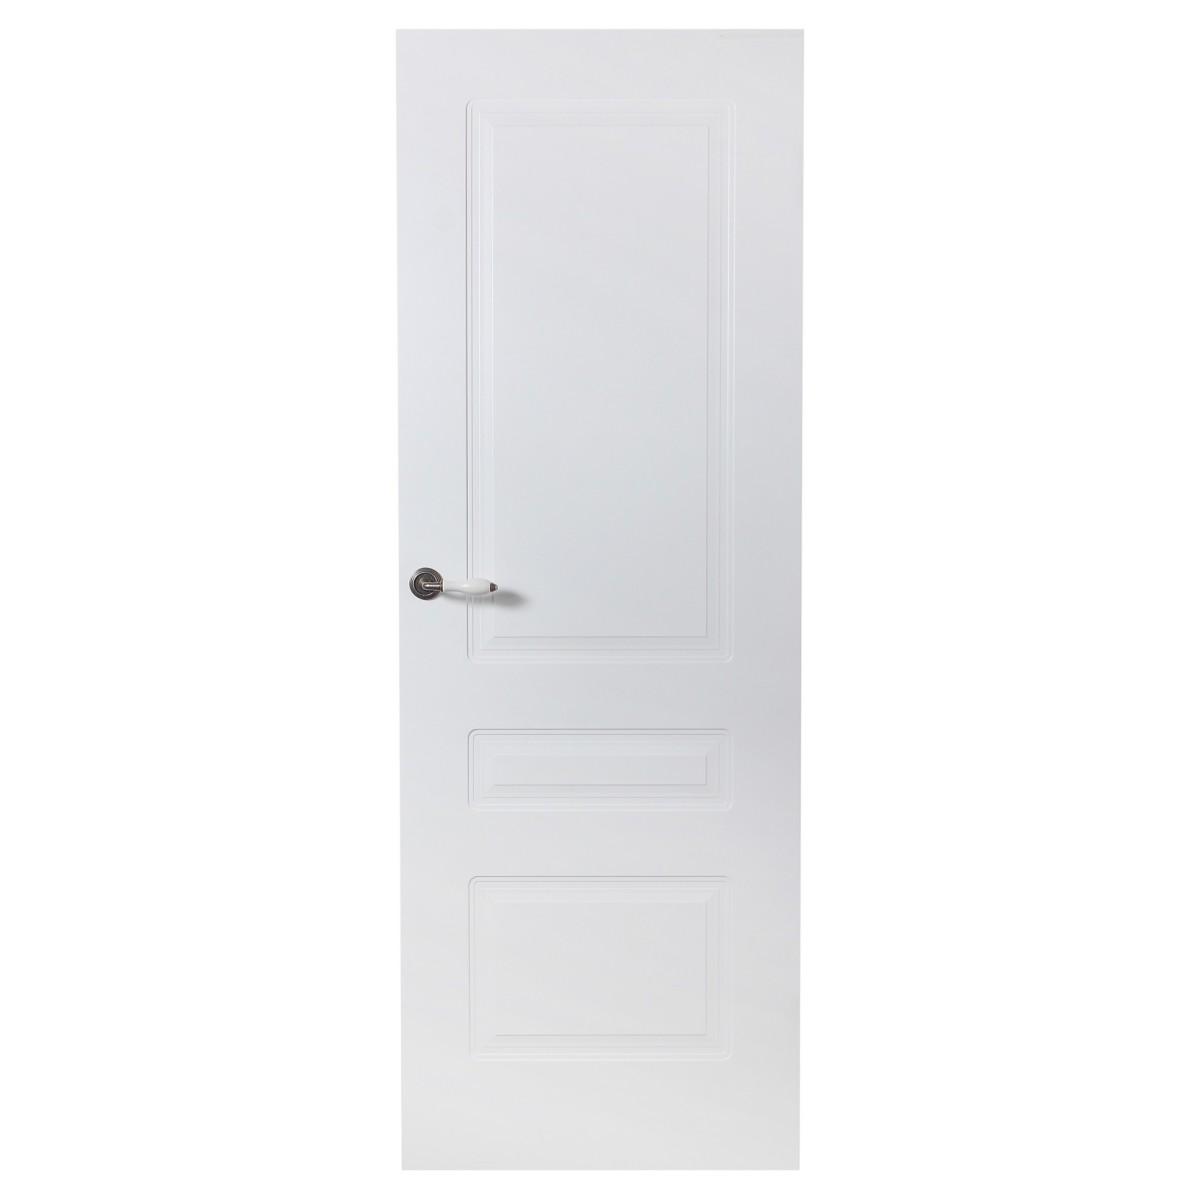 Дверь межкомнатная глухая Роялти 90x200 см цвет белый